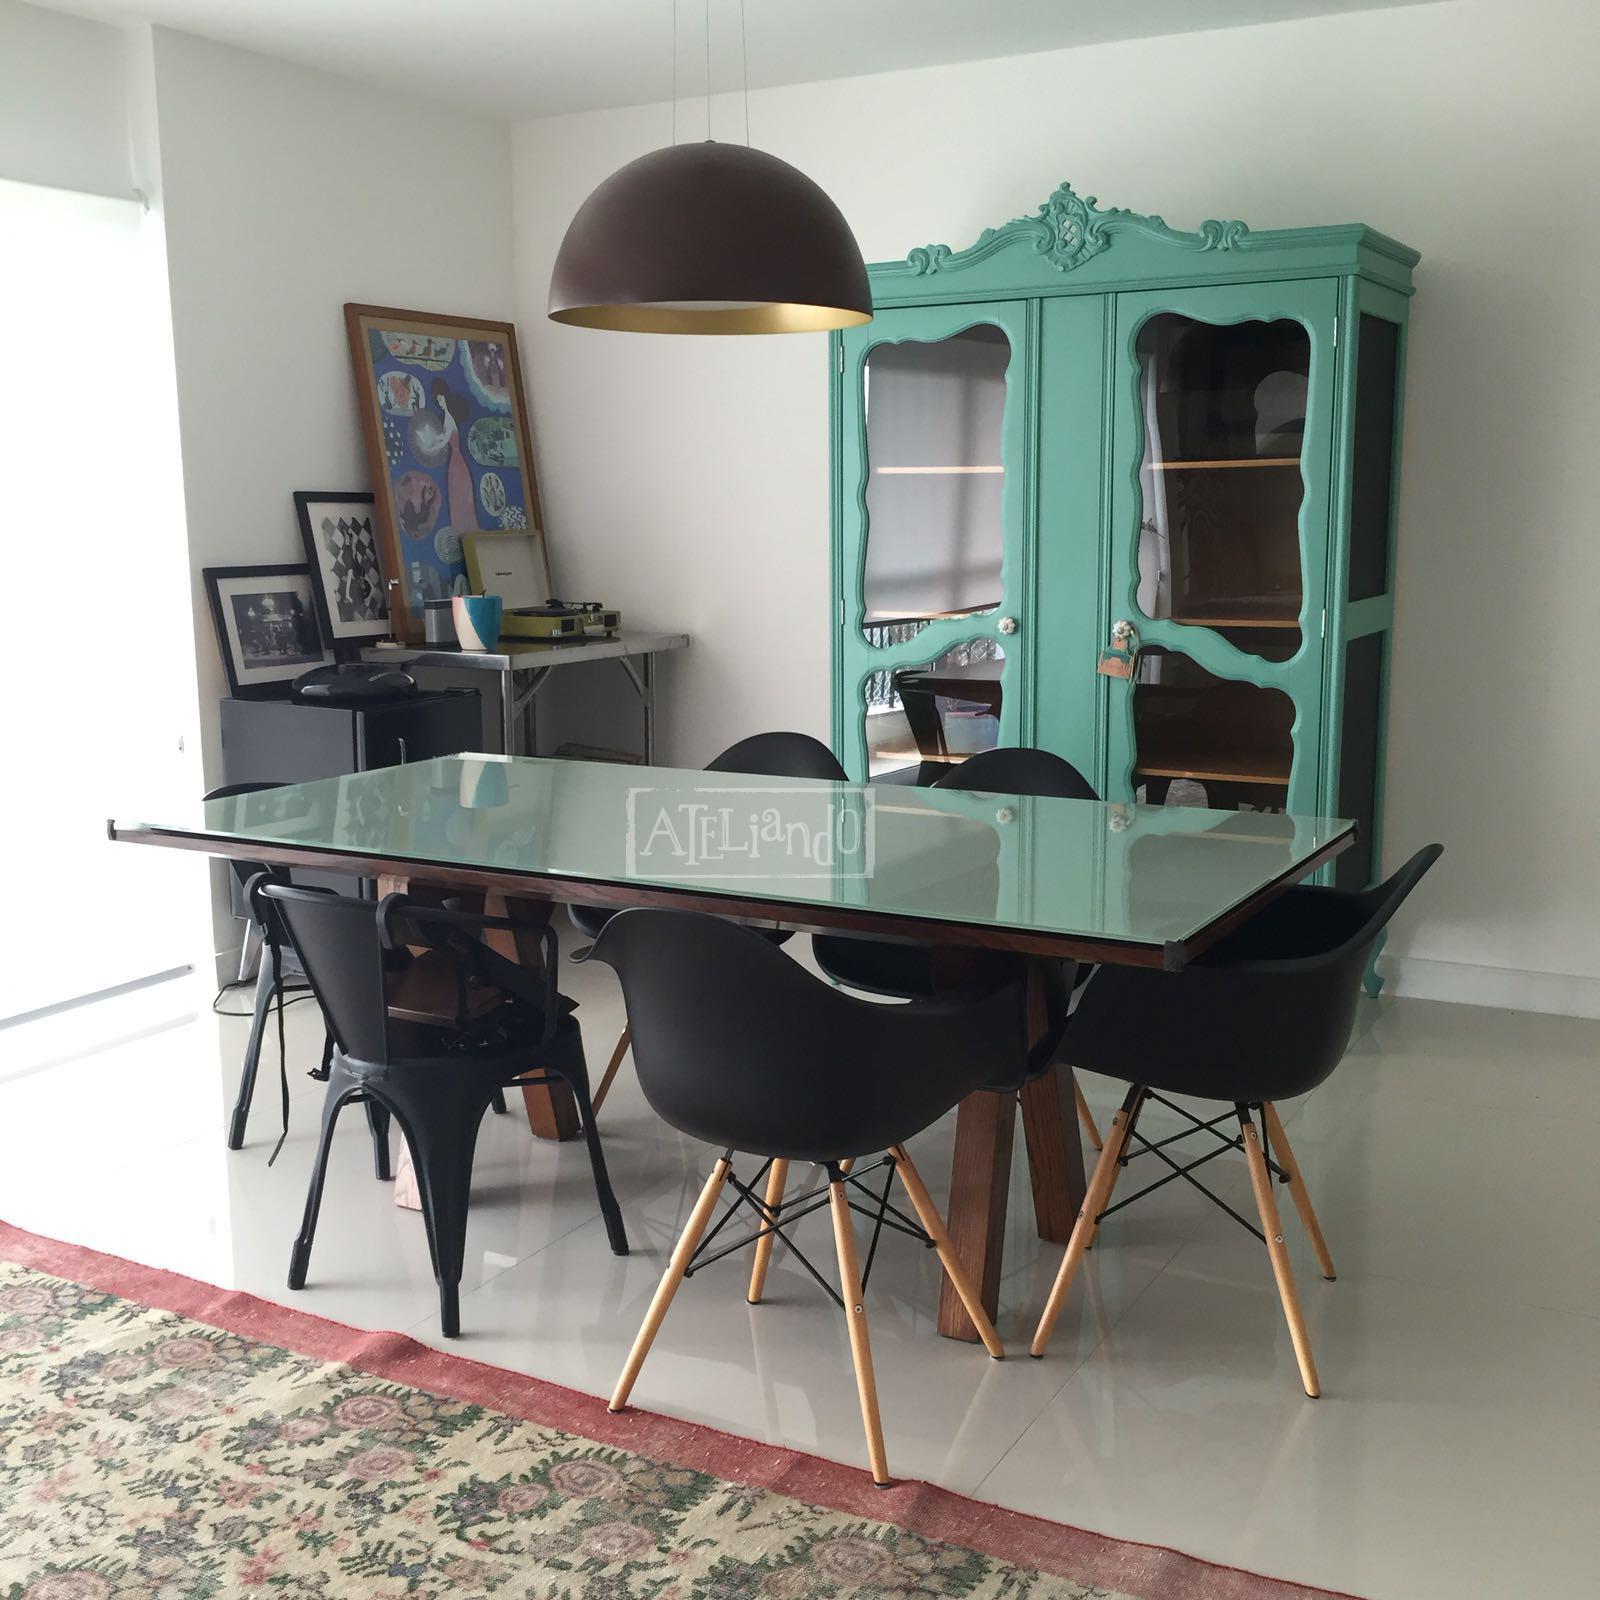 Moveis Para Sala De Jantar Antigos ~   Customização de móveis antigos Sala de jantar vintage